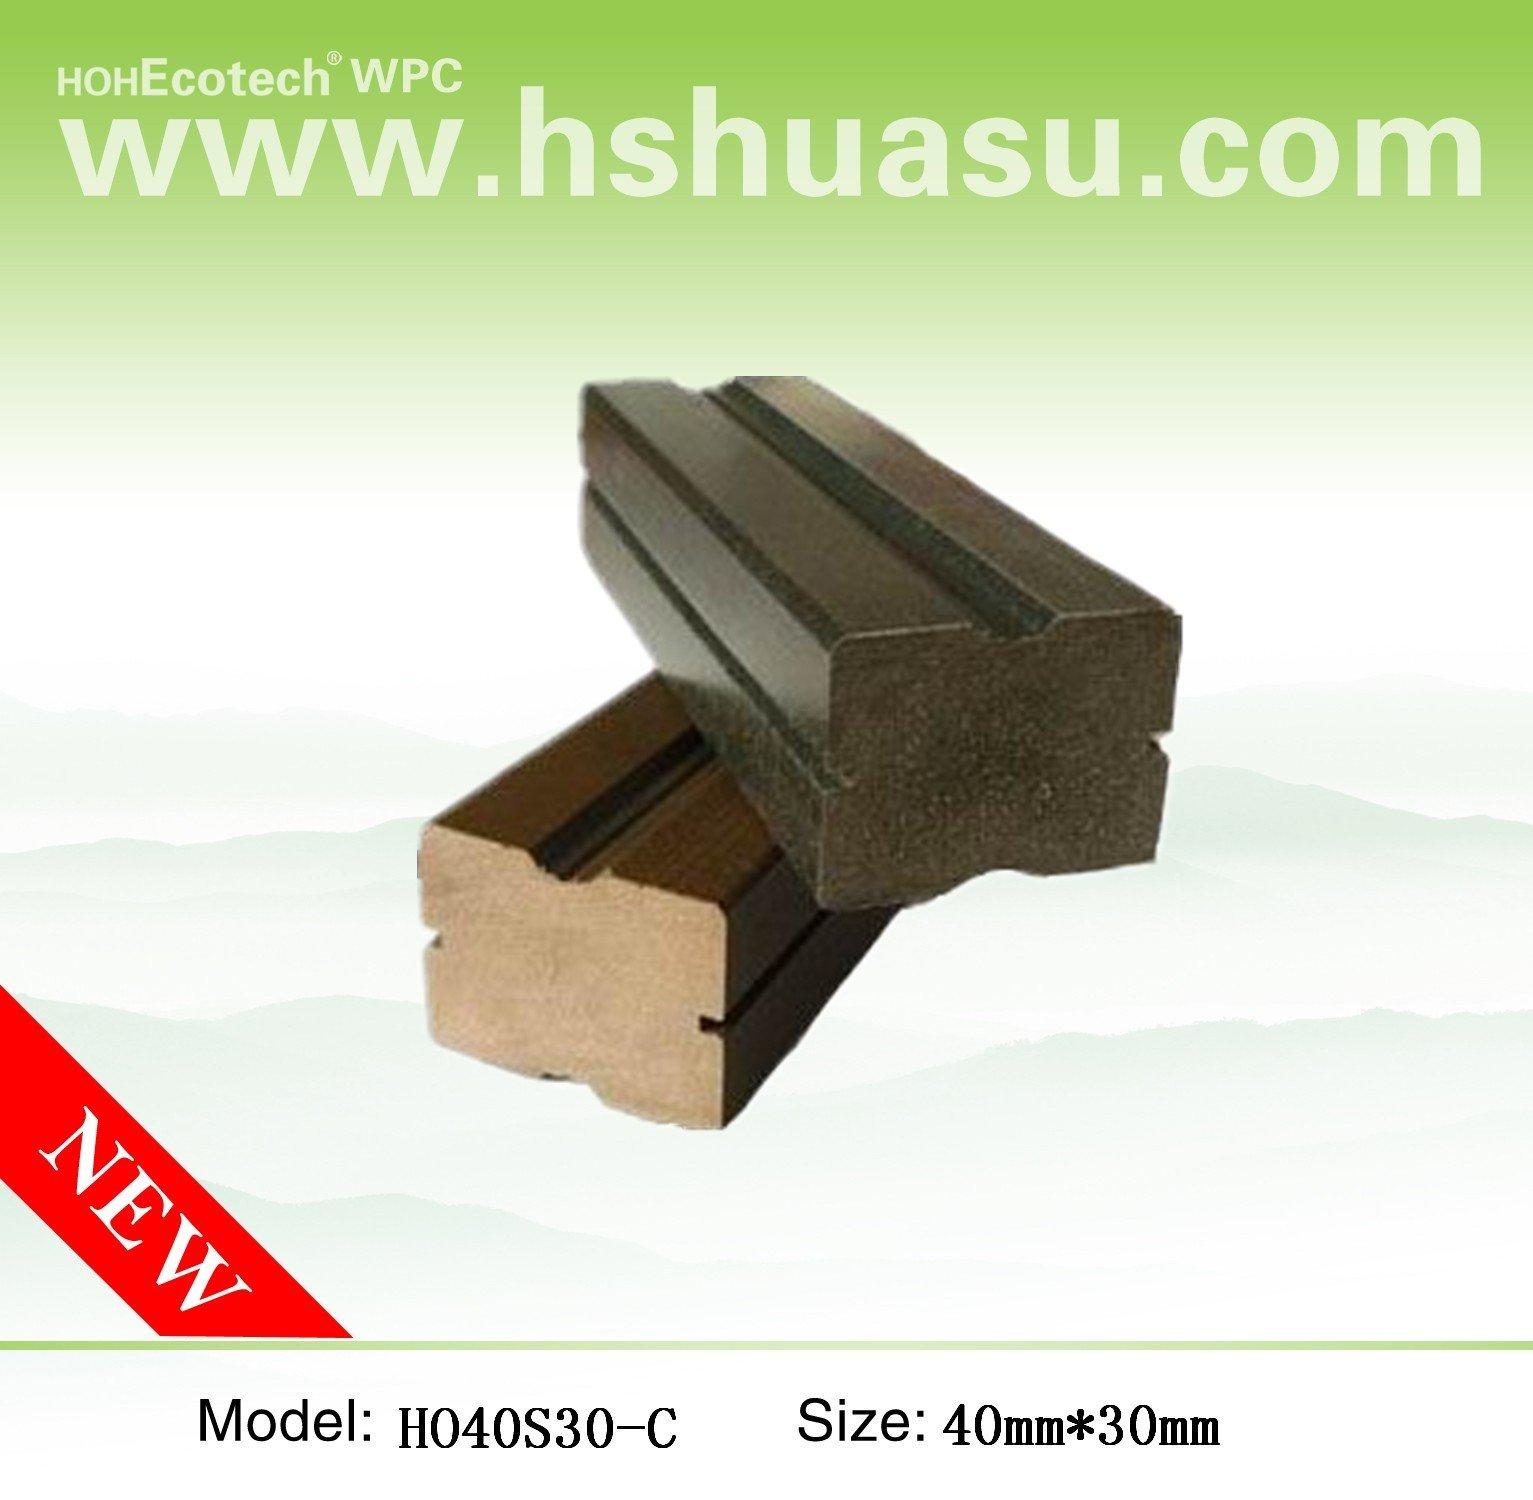 固体joist_hd40s30-c